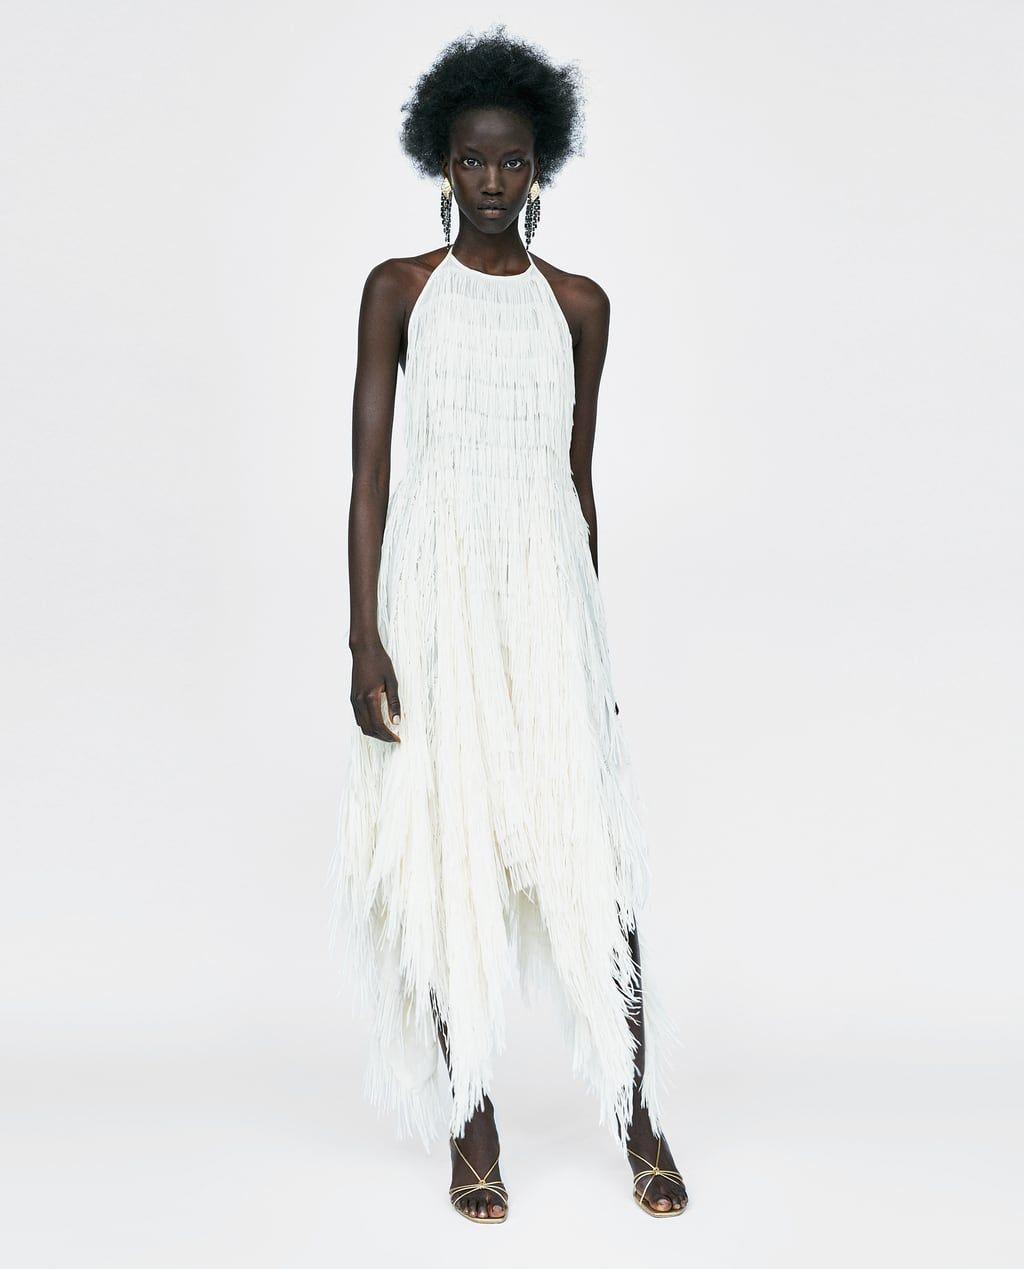 6ea89fdd VESTIDO HALTER FLECOS | Style ღஐƸ̵̡Ӝ̵̨̄Ʒஐღ¸ | Dresses, Zara ...